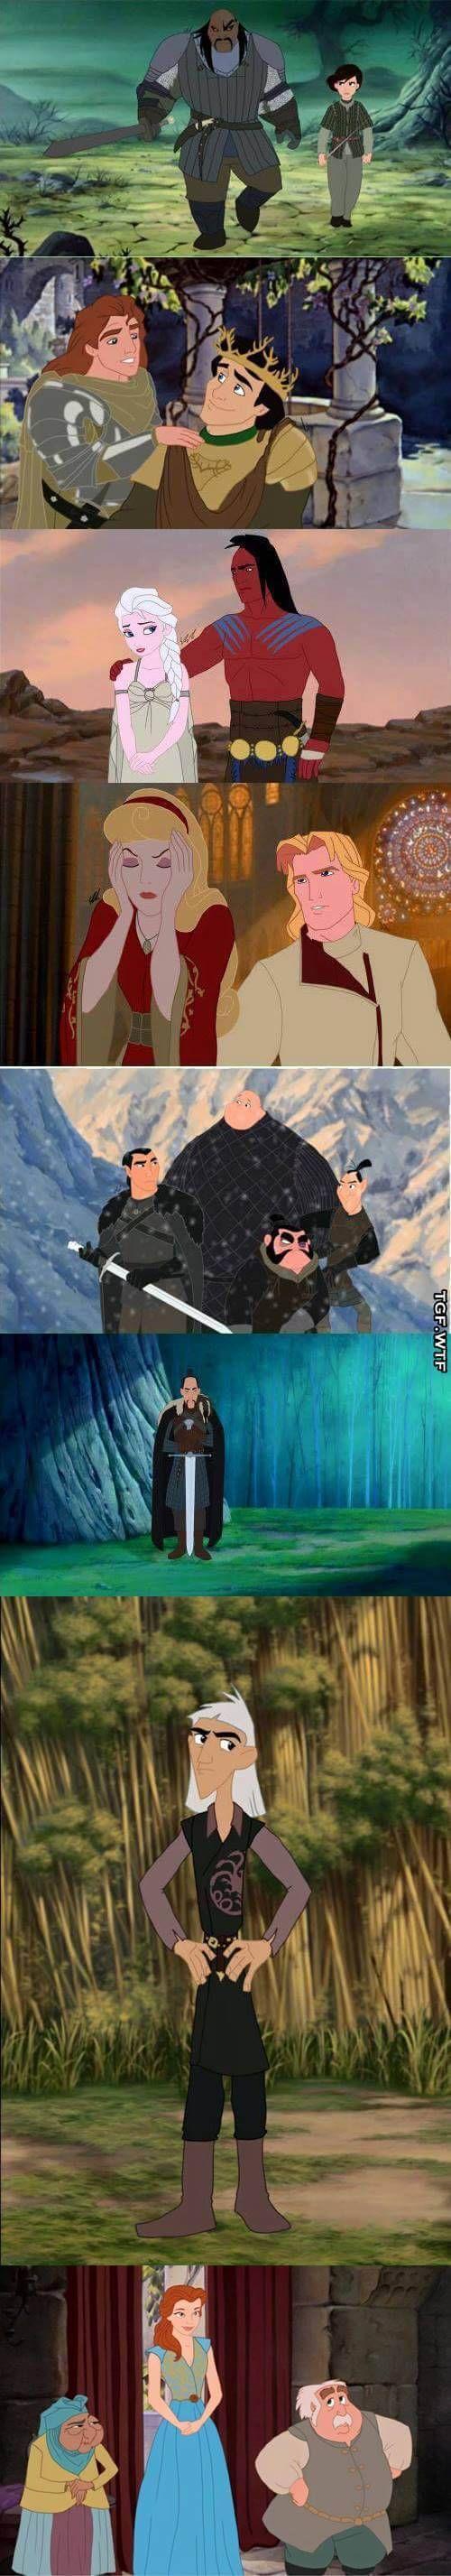 Game of Thrones Meets Disney Part 2 - Gaggz.com